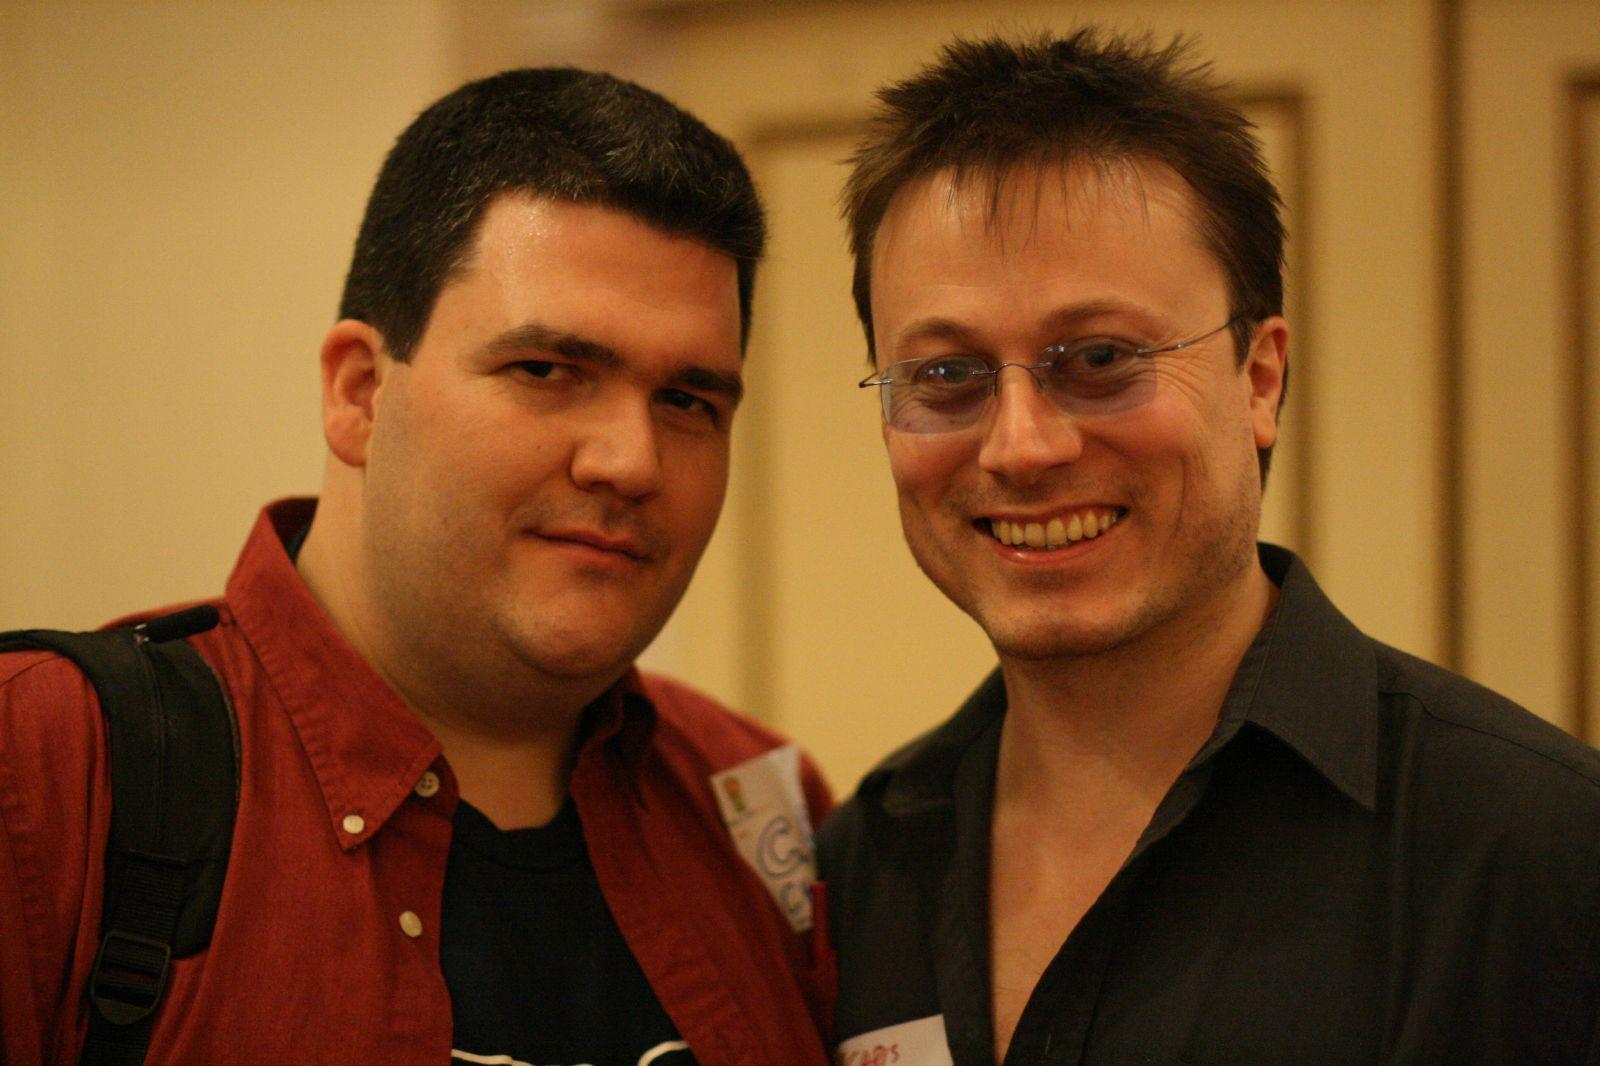 Chris Hambly & C.C. Chapman